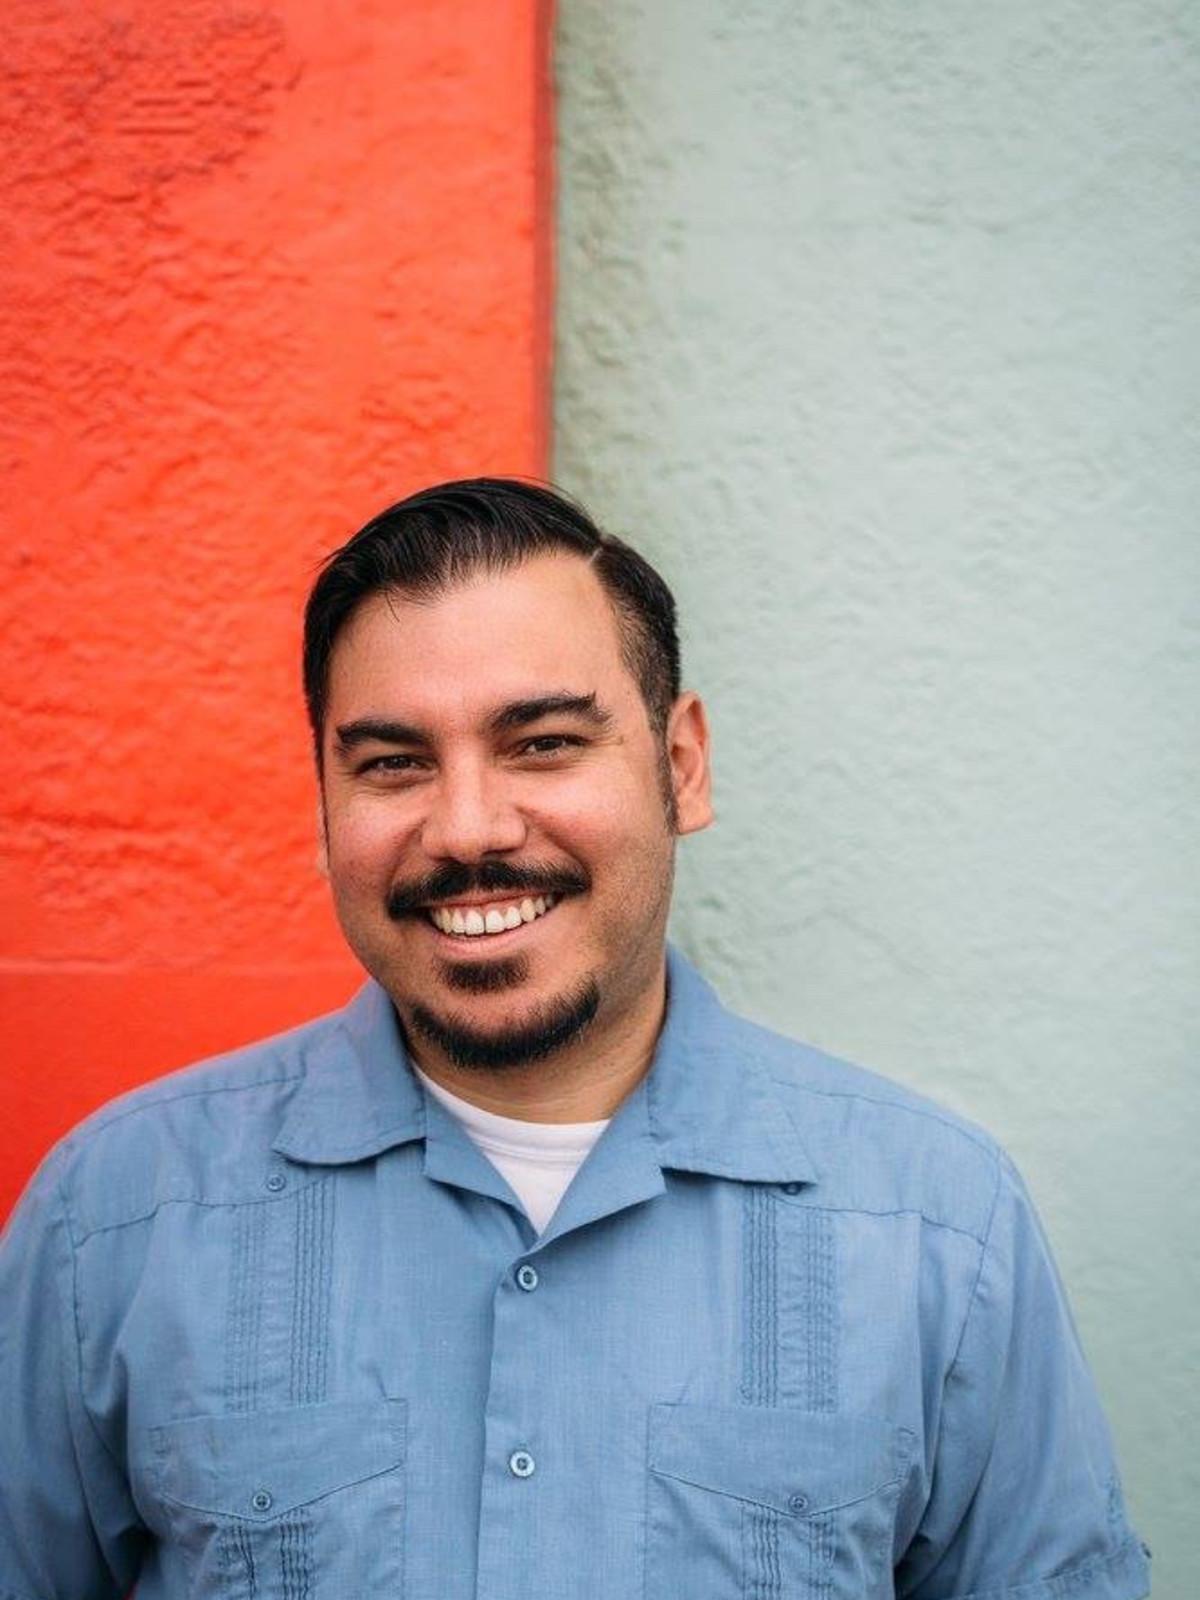 Texas Monthly hires Dallas writer-blogger as new taco editor ... on eater dallas, art institute of dallas, nick and dallas, trammell crow park dallas, culture in dallas, dirk nowitzki house in dallas, houston dallas,